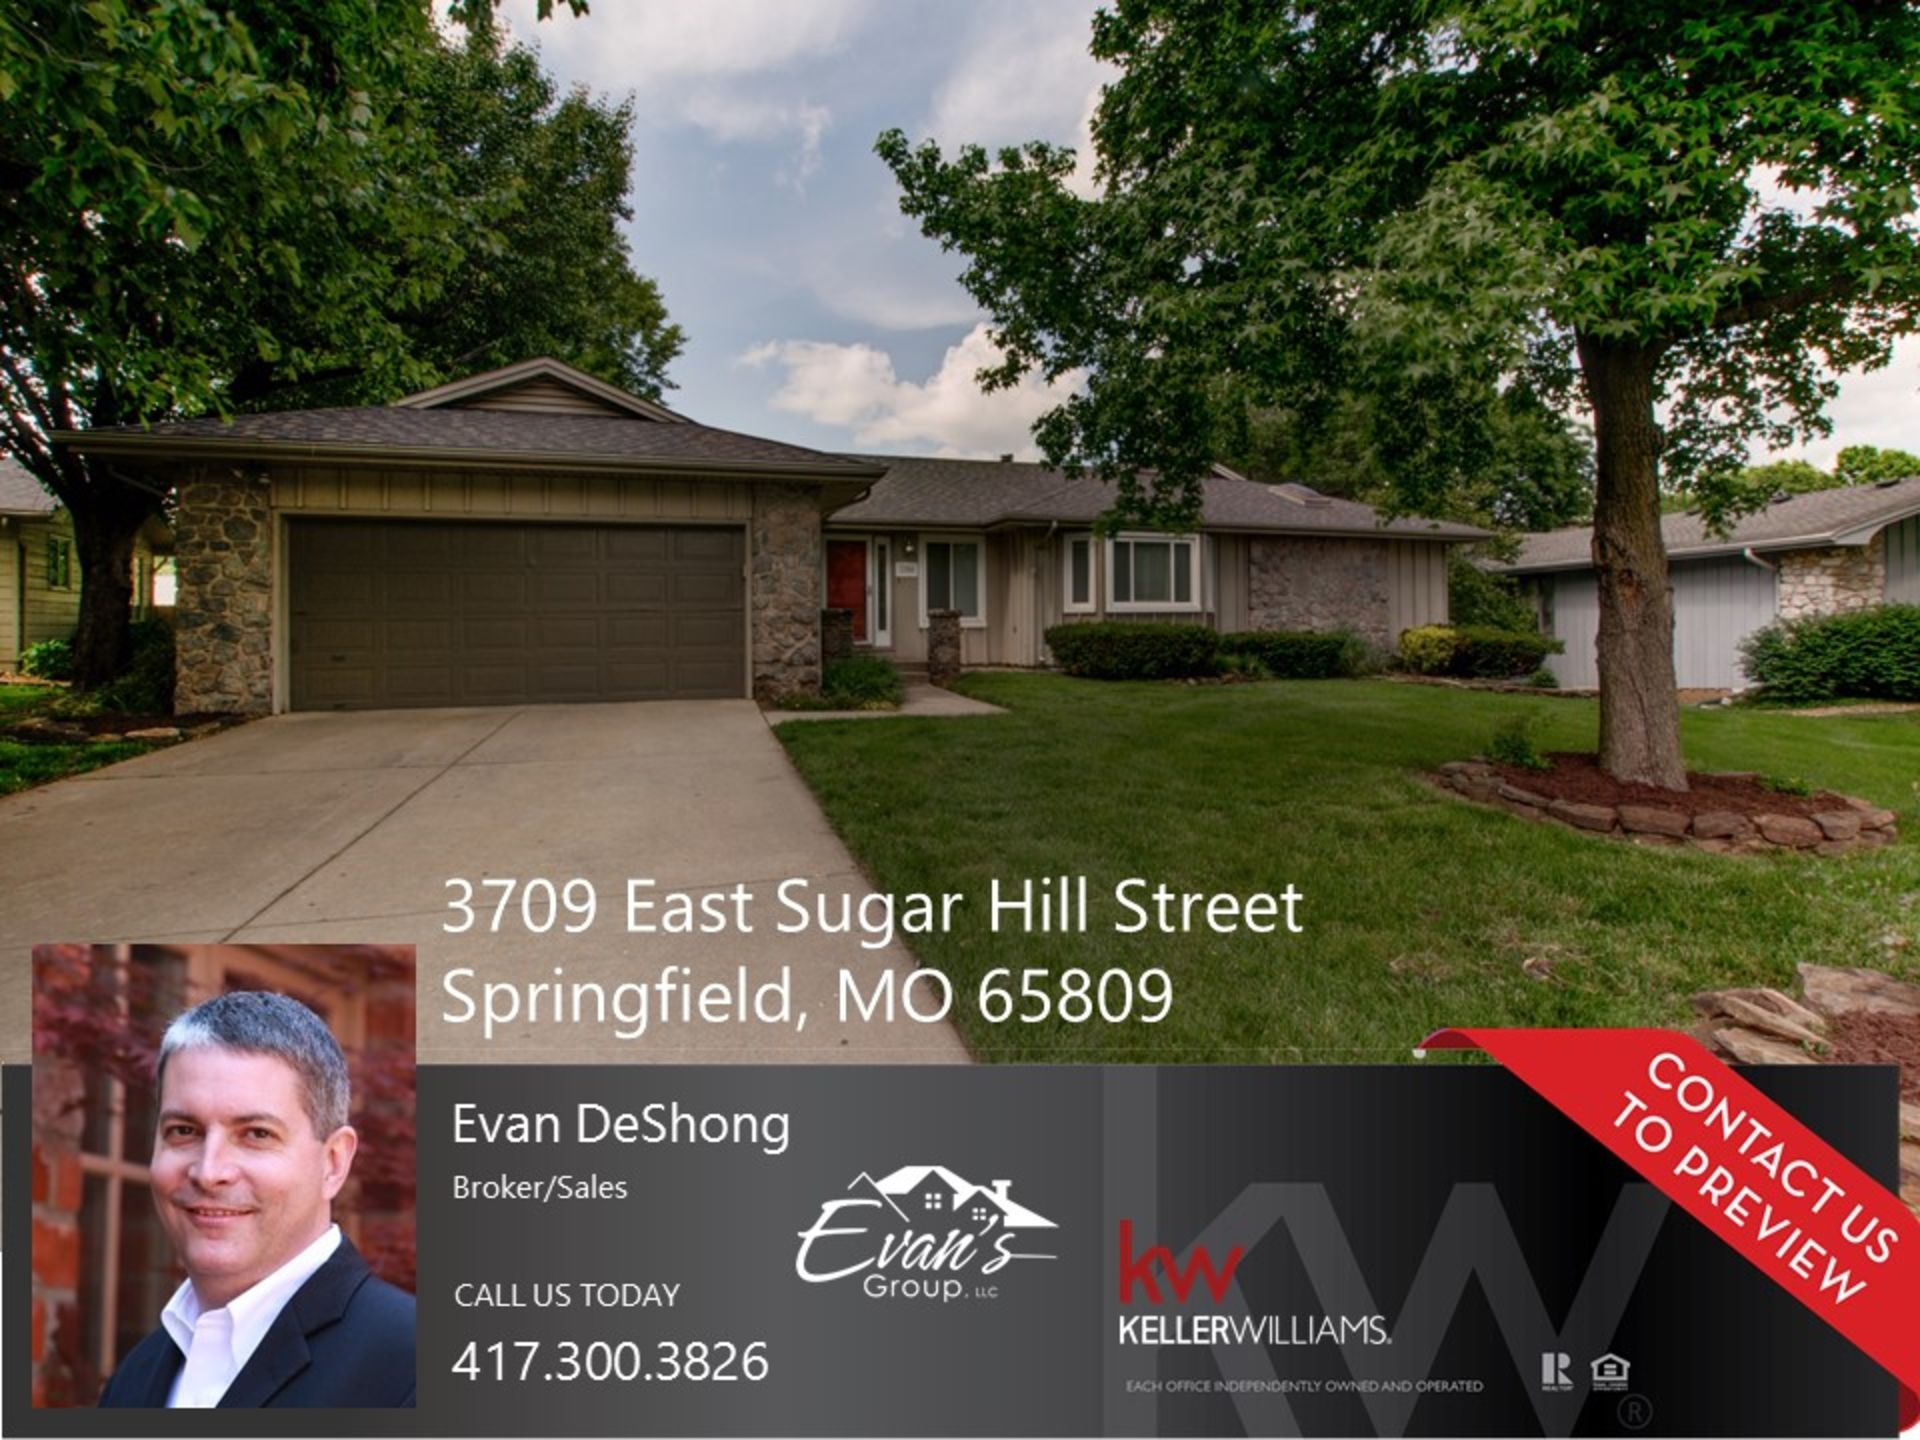 Real Estate For Sale Springfield, MO – Sugar Hill